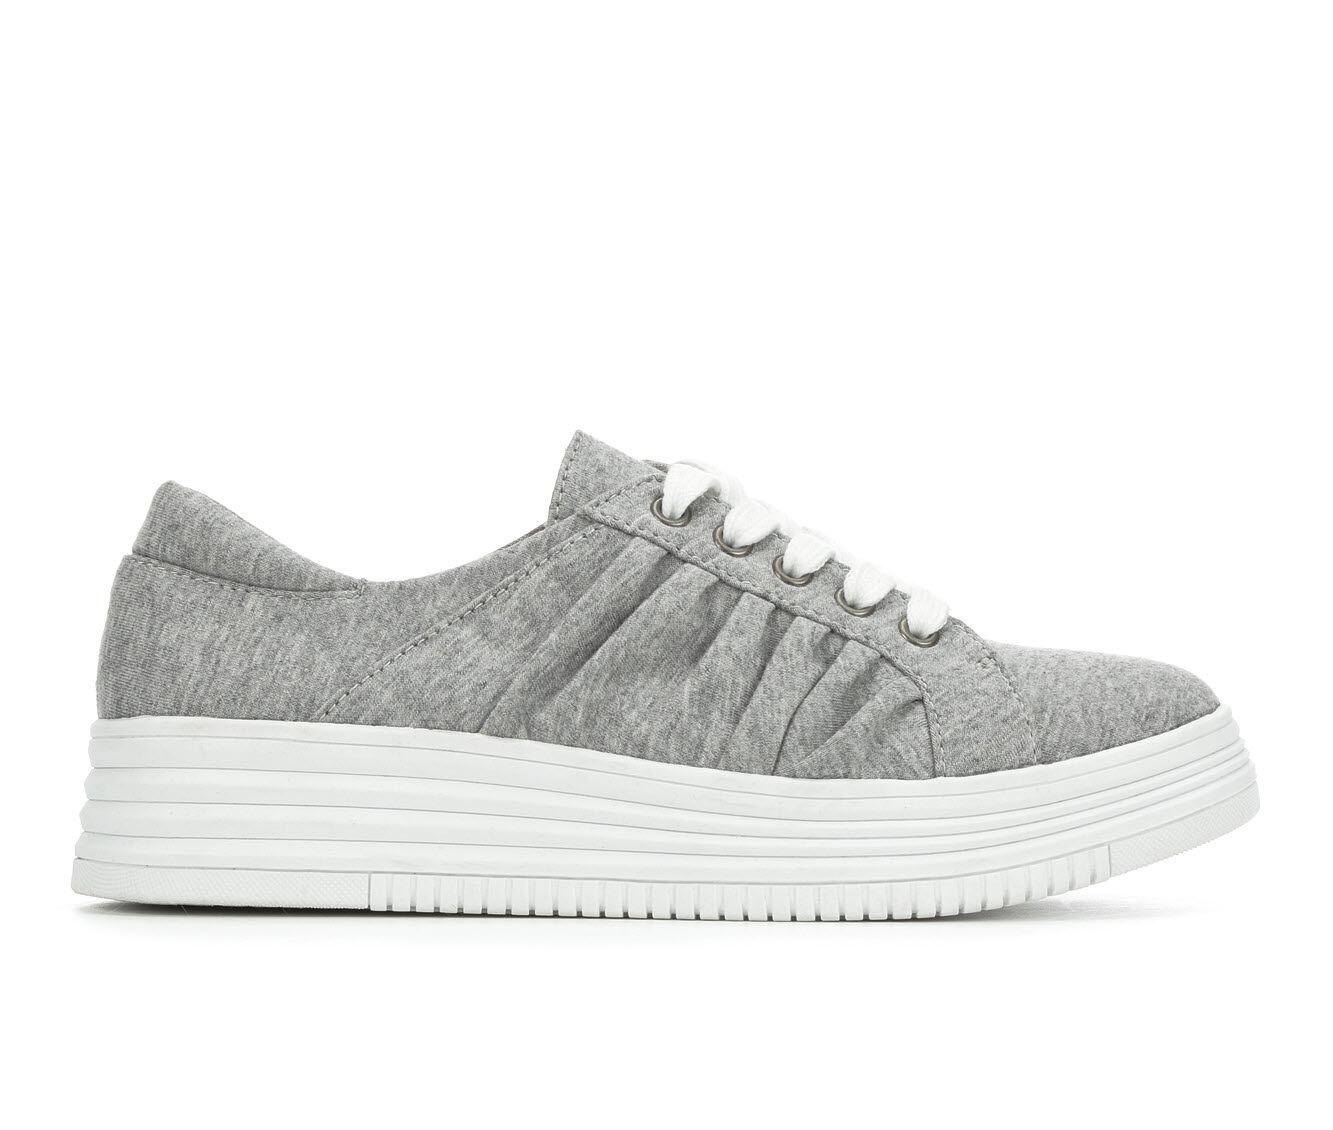 shop cheap new arrivals Women's Rocket Dog Basha Flatform Sneakers Grey Jersey